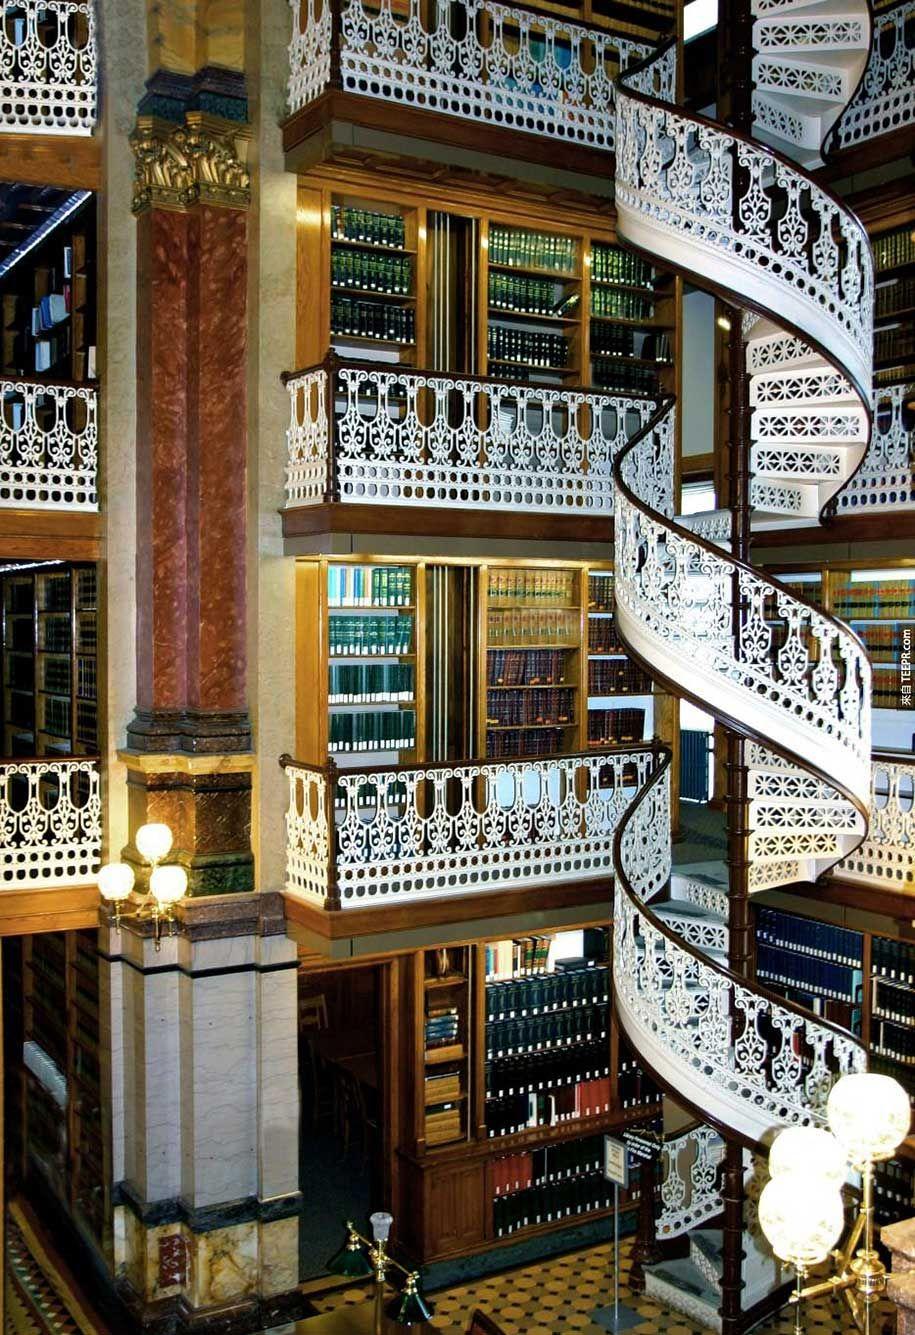 libros libreria cultura inquieta libraries 16